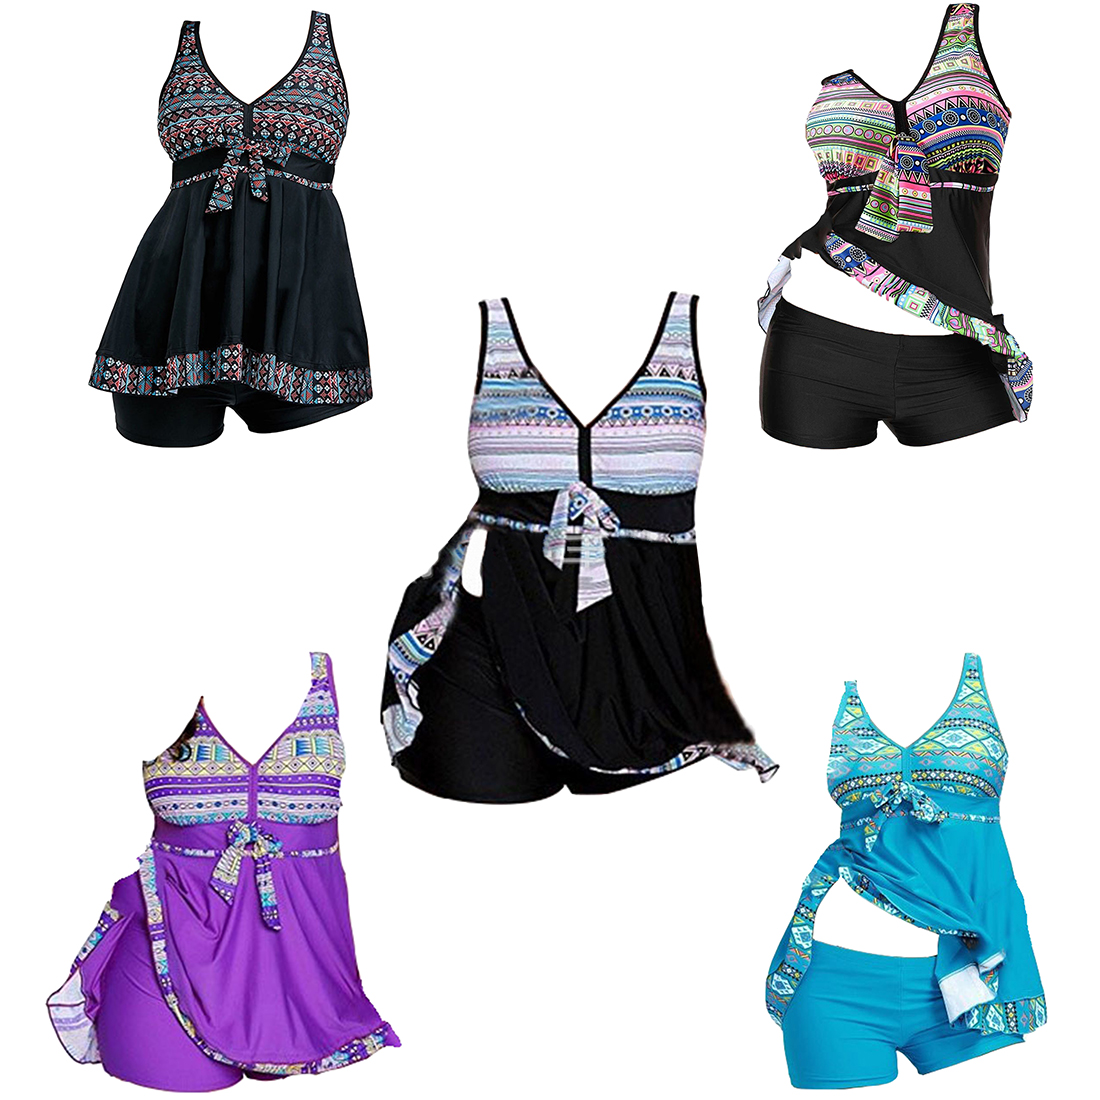 Large Size Swimwear Dress Big Two pieces Swimsuit Women With Skirt Retro Conservative Bikini Beach Female Bathing Suit Beachwear все цены